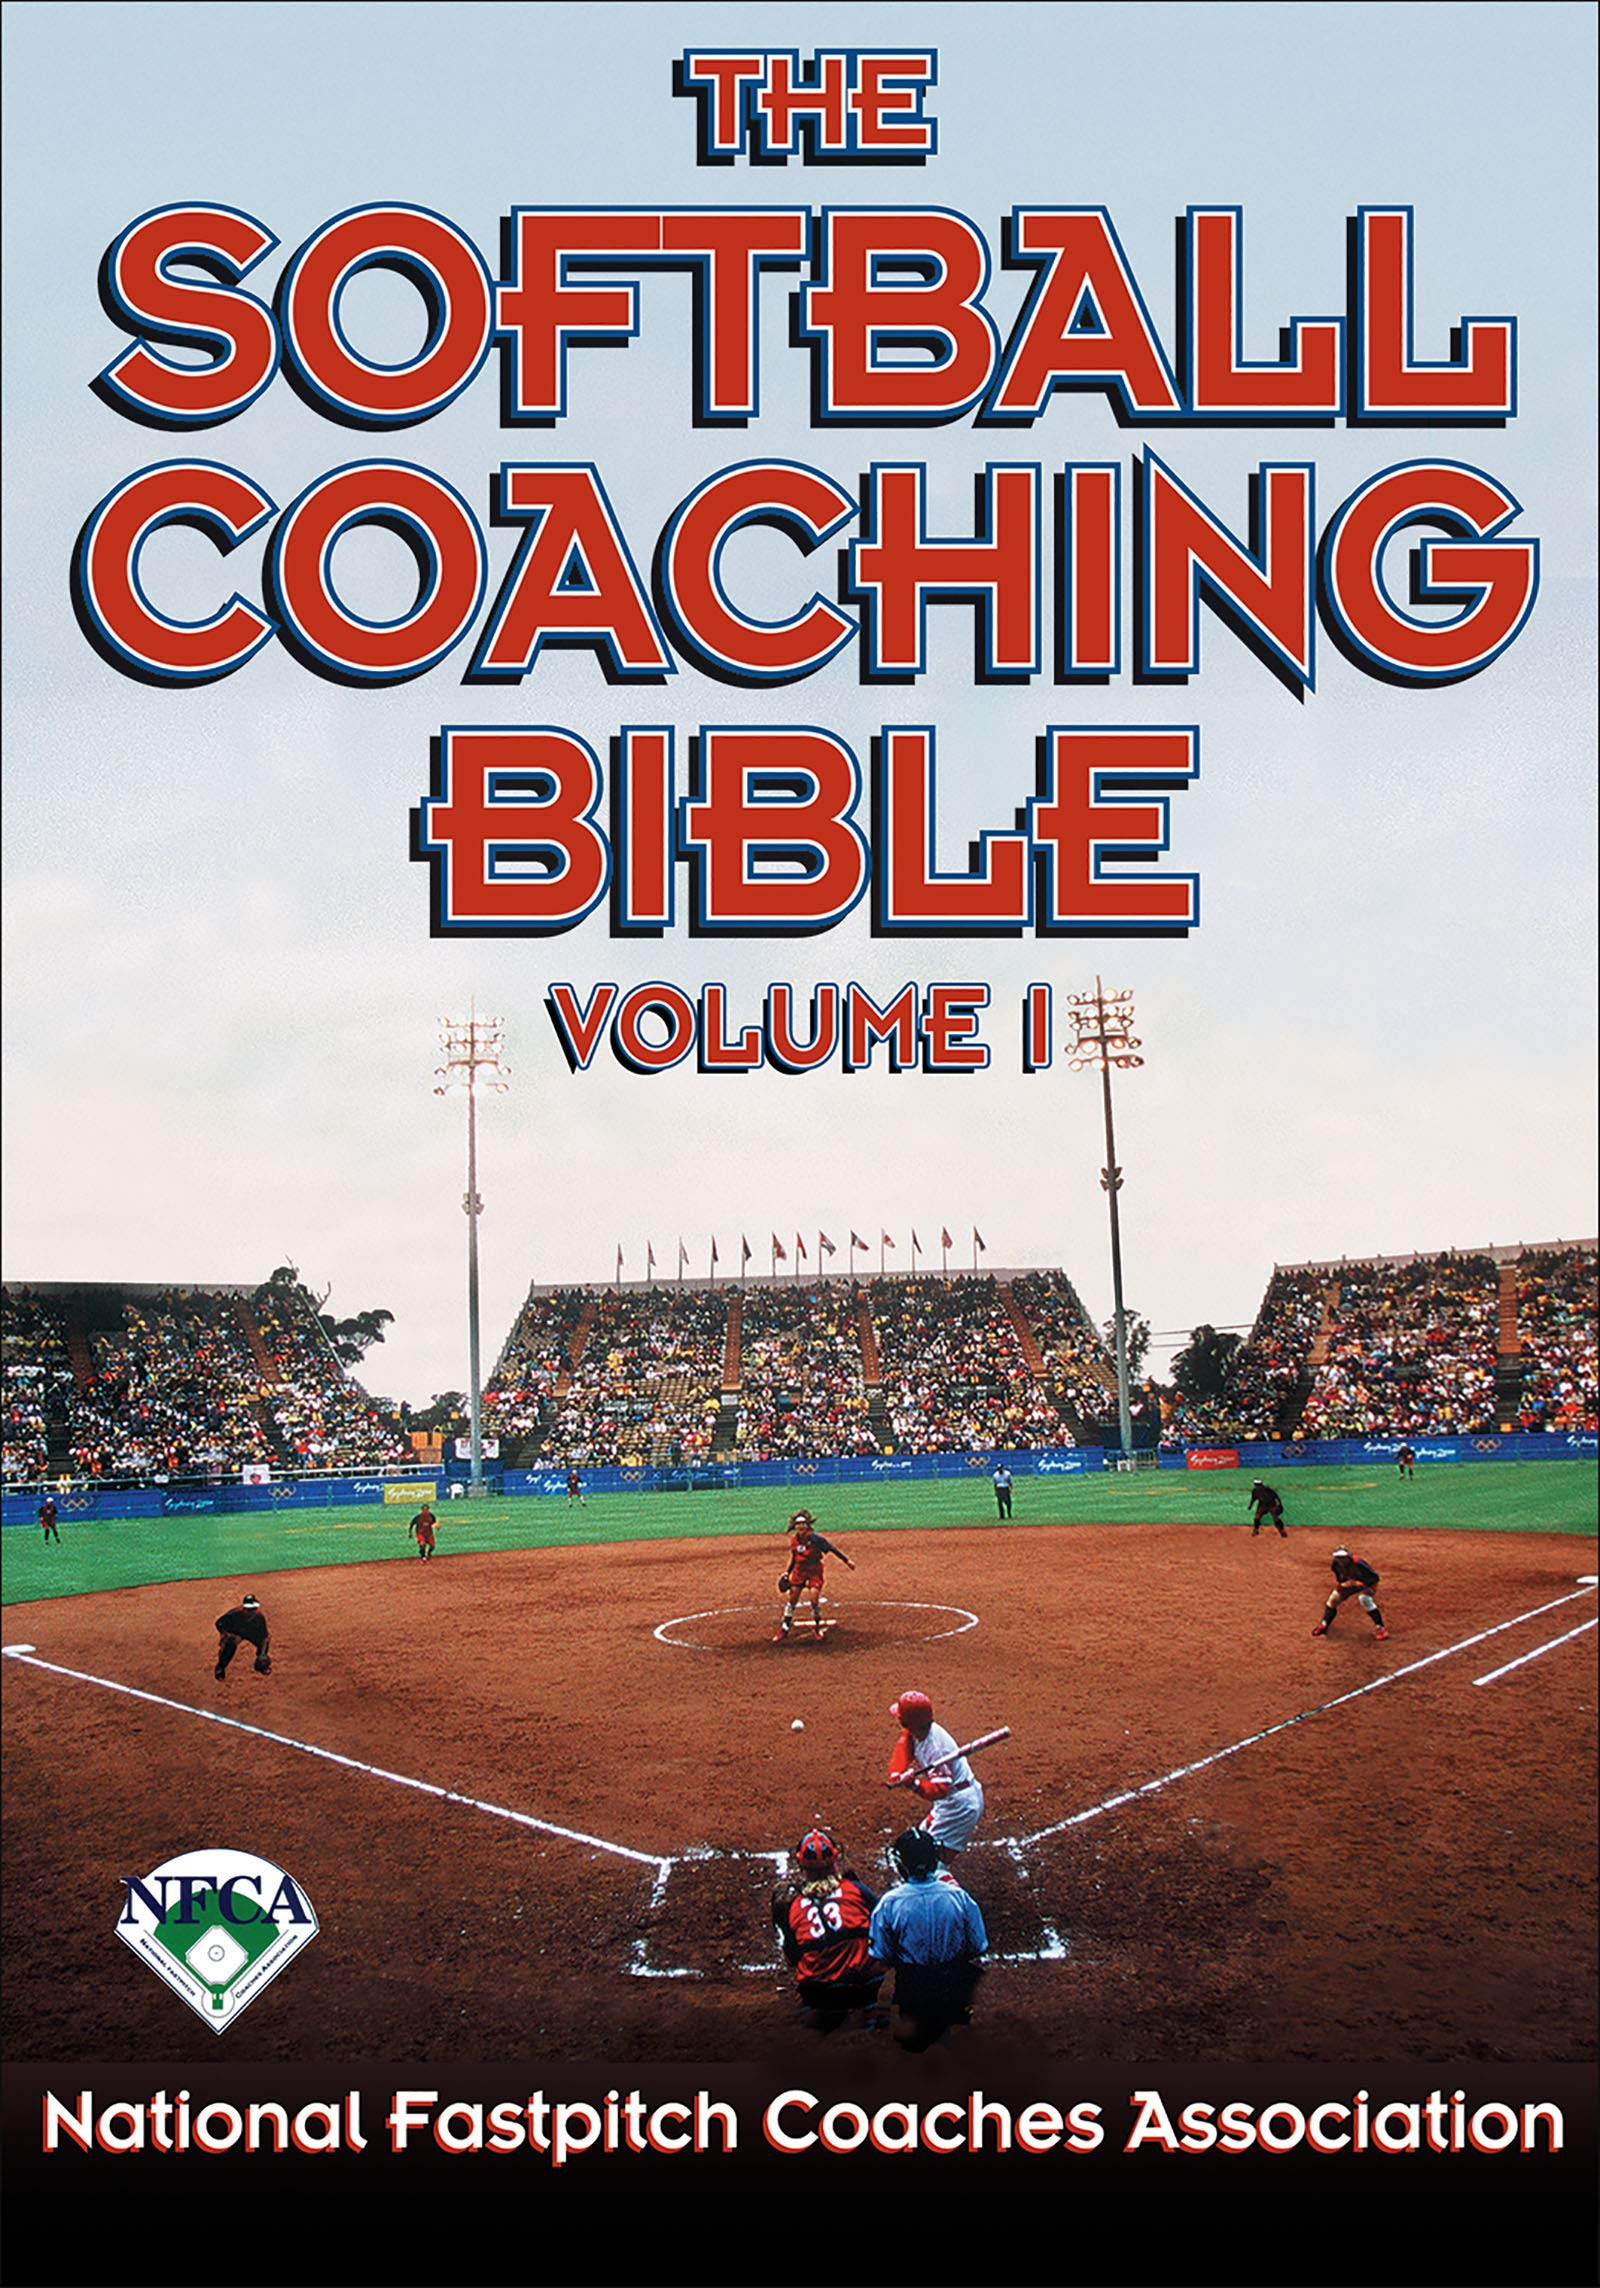 The Softball Coaching Bible, Volume I: National Fastpitch Coaches  Association: 9780736038270: Amazon.com: Books